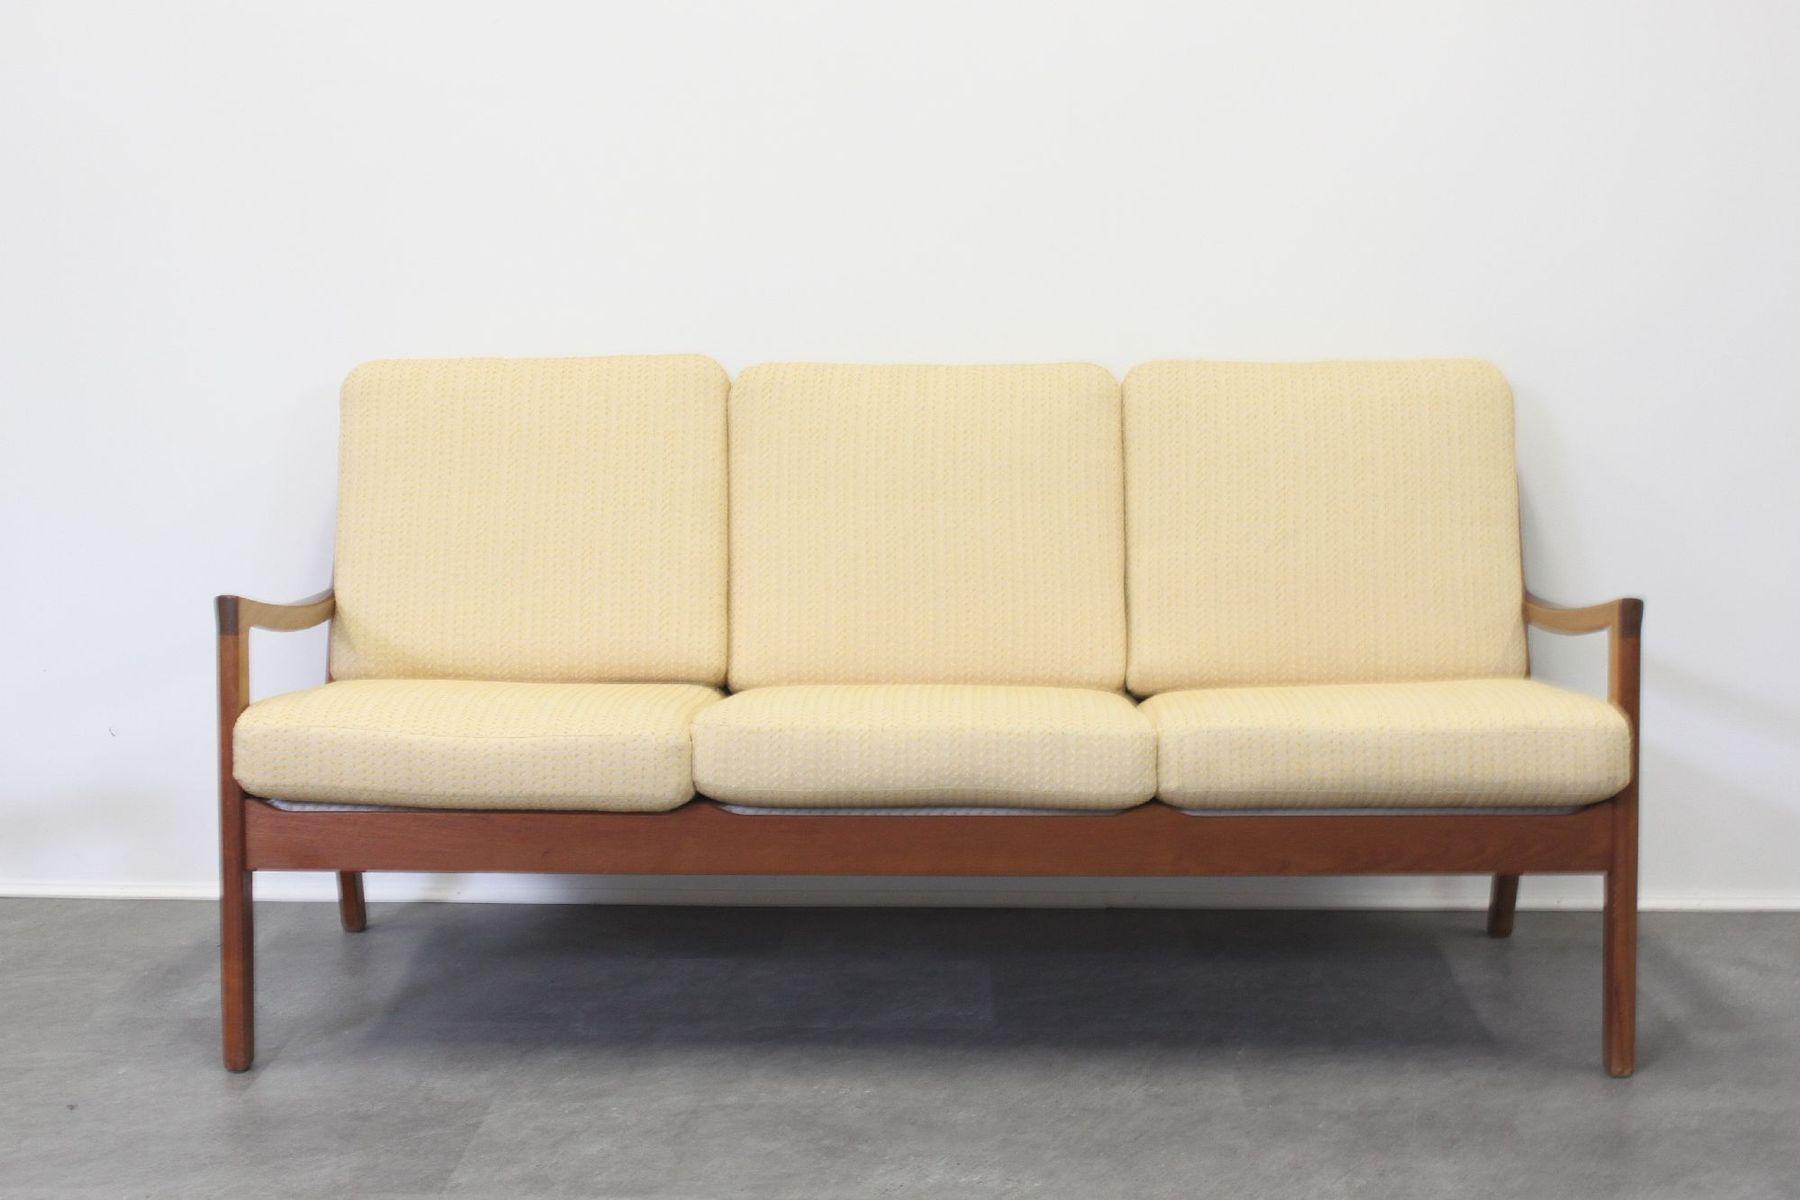 sofa dreisitzer fabulous vintage teak dreisitzer senator. Black Bedroom Furniture Sets. Home Design Ideas